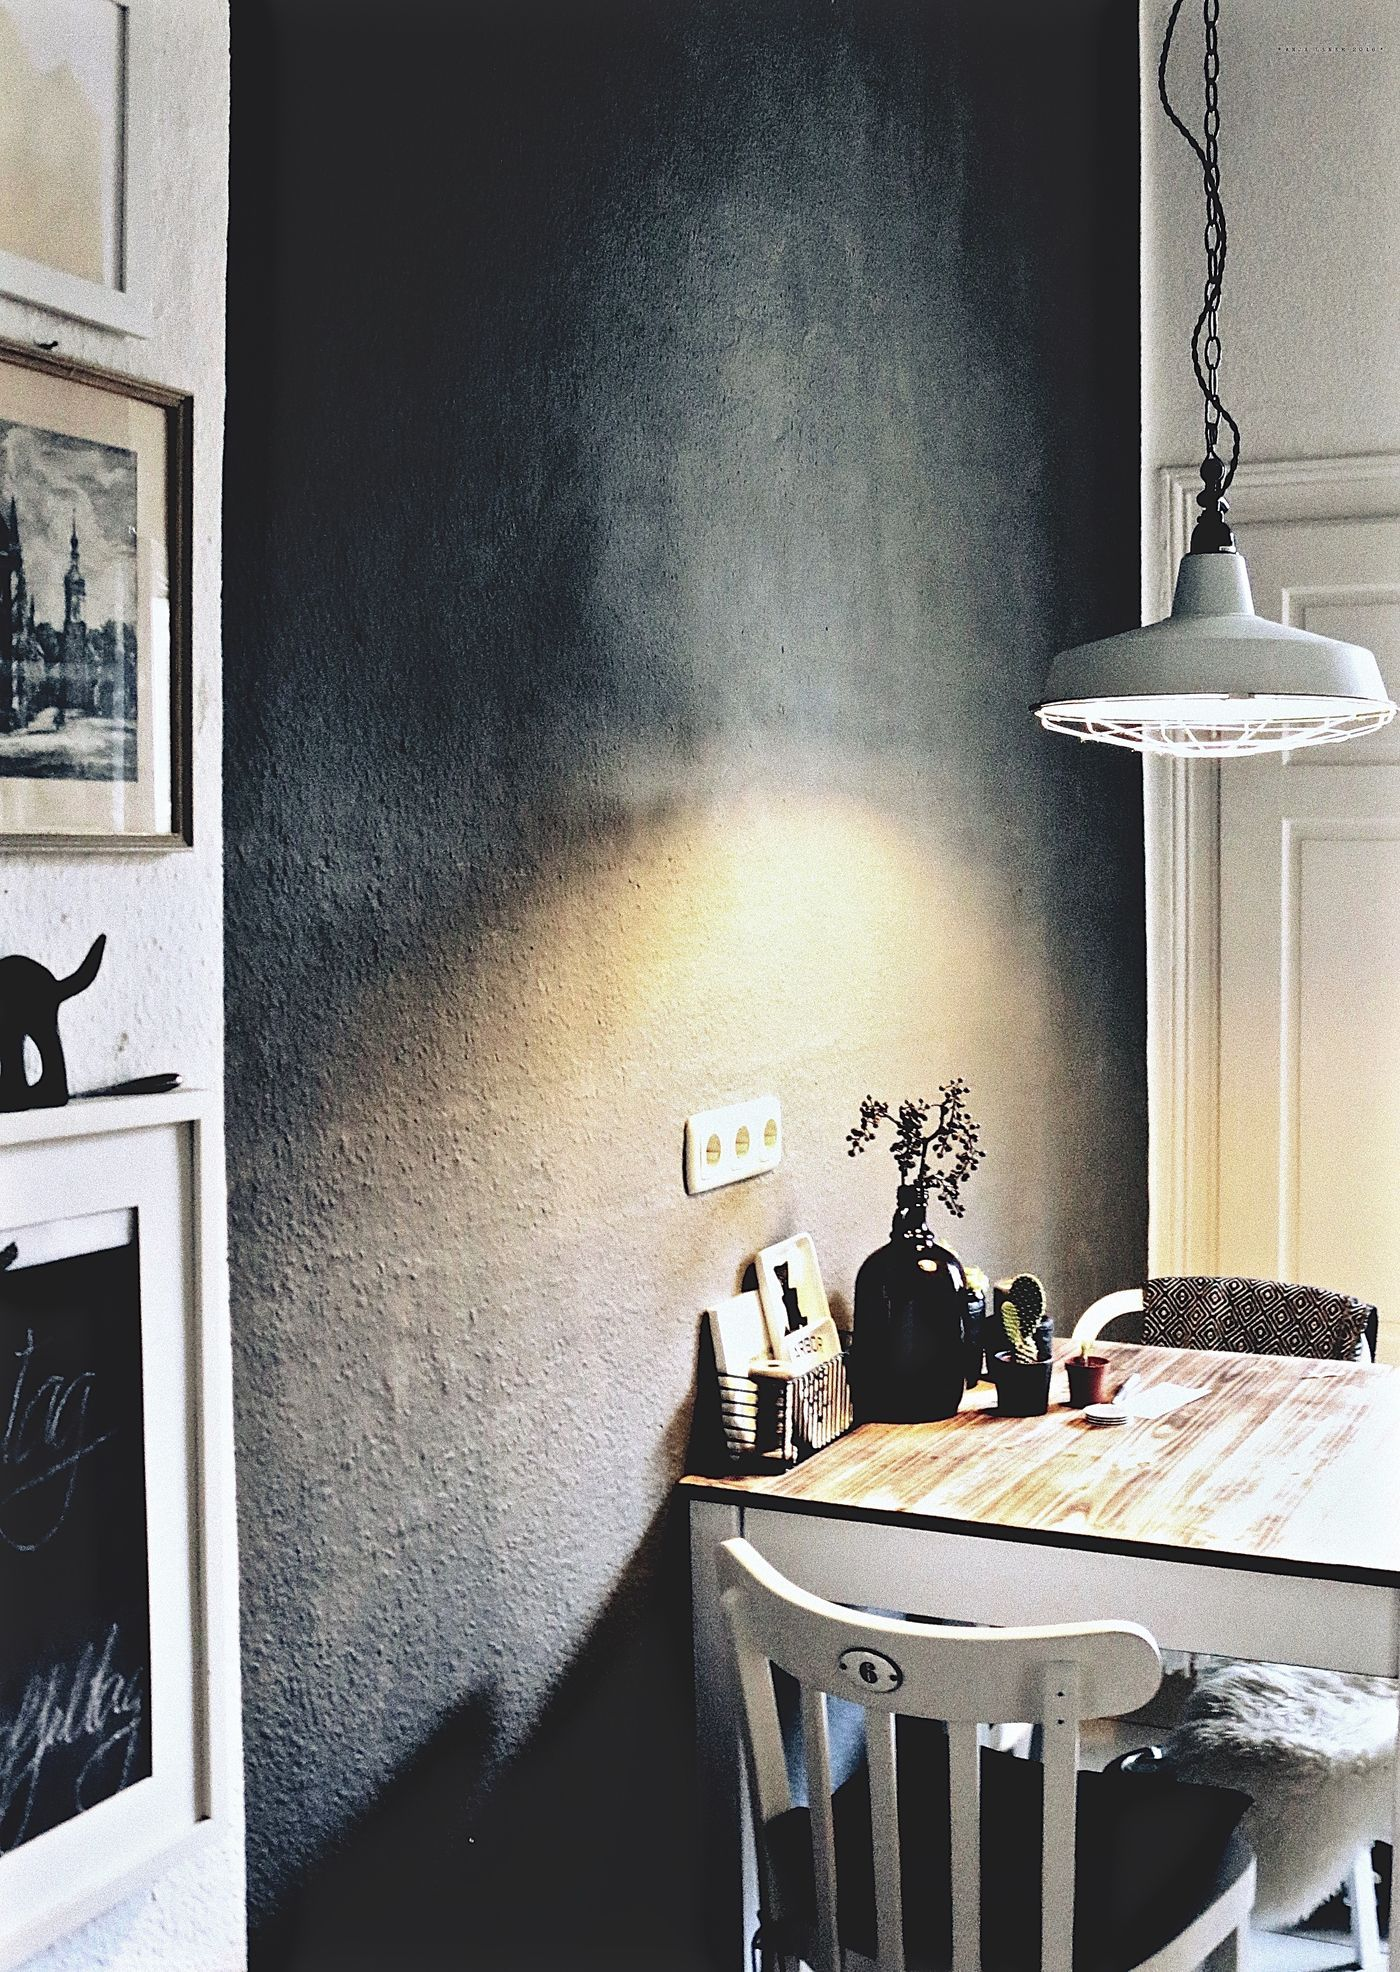 do it yourself ideen f r dein zuhause seite 11. Black Bedroom Furniture Sets. Home Design Ideas